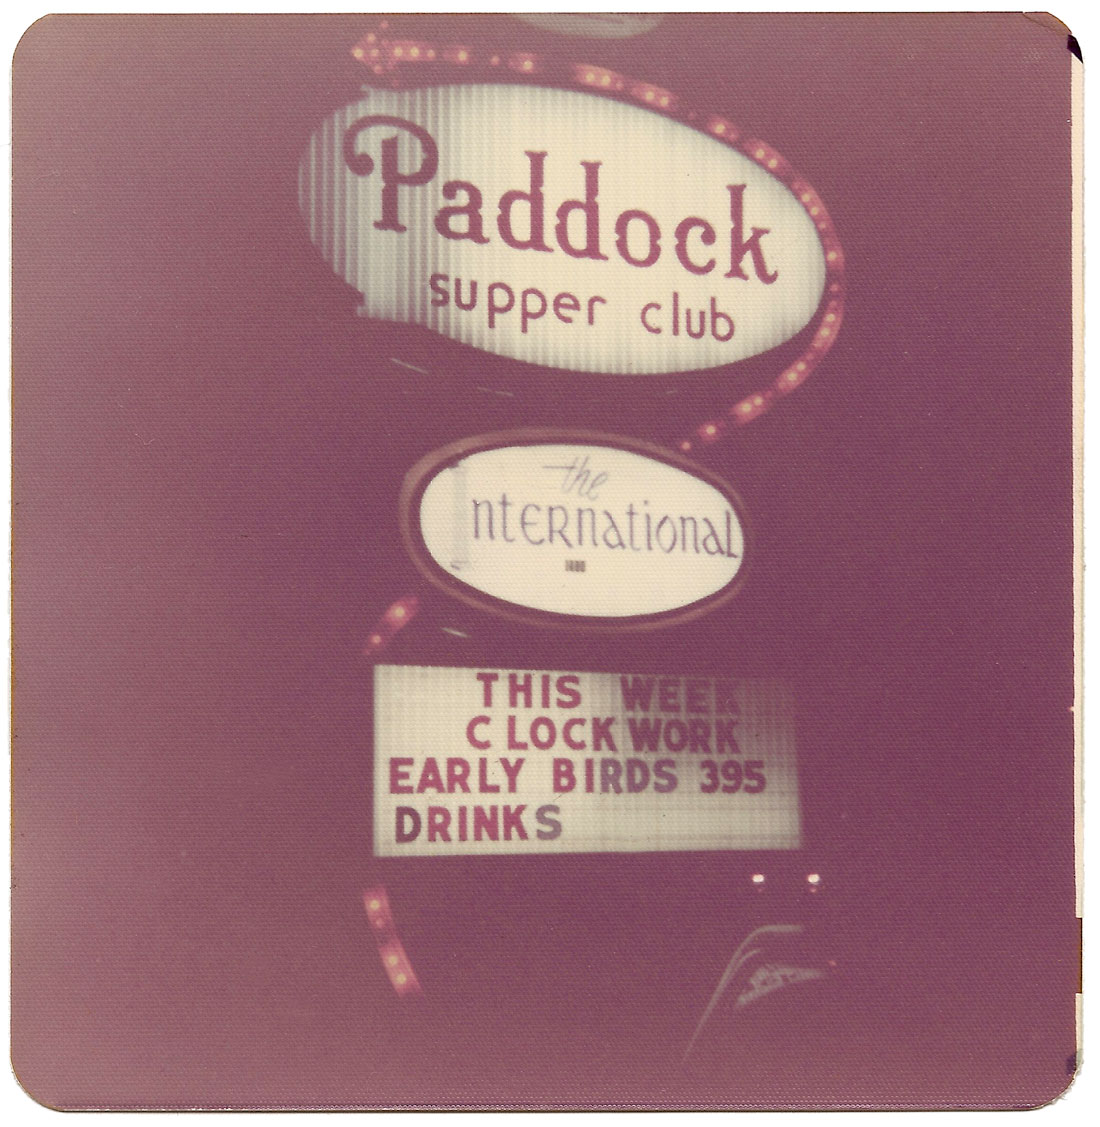 Paddock sign